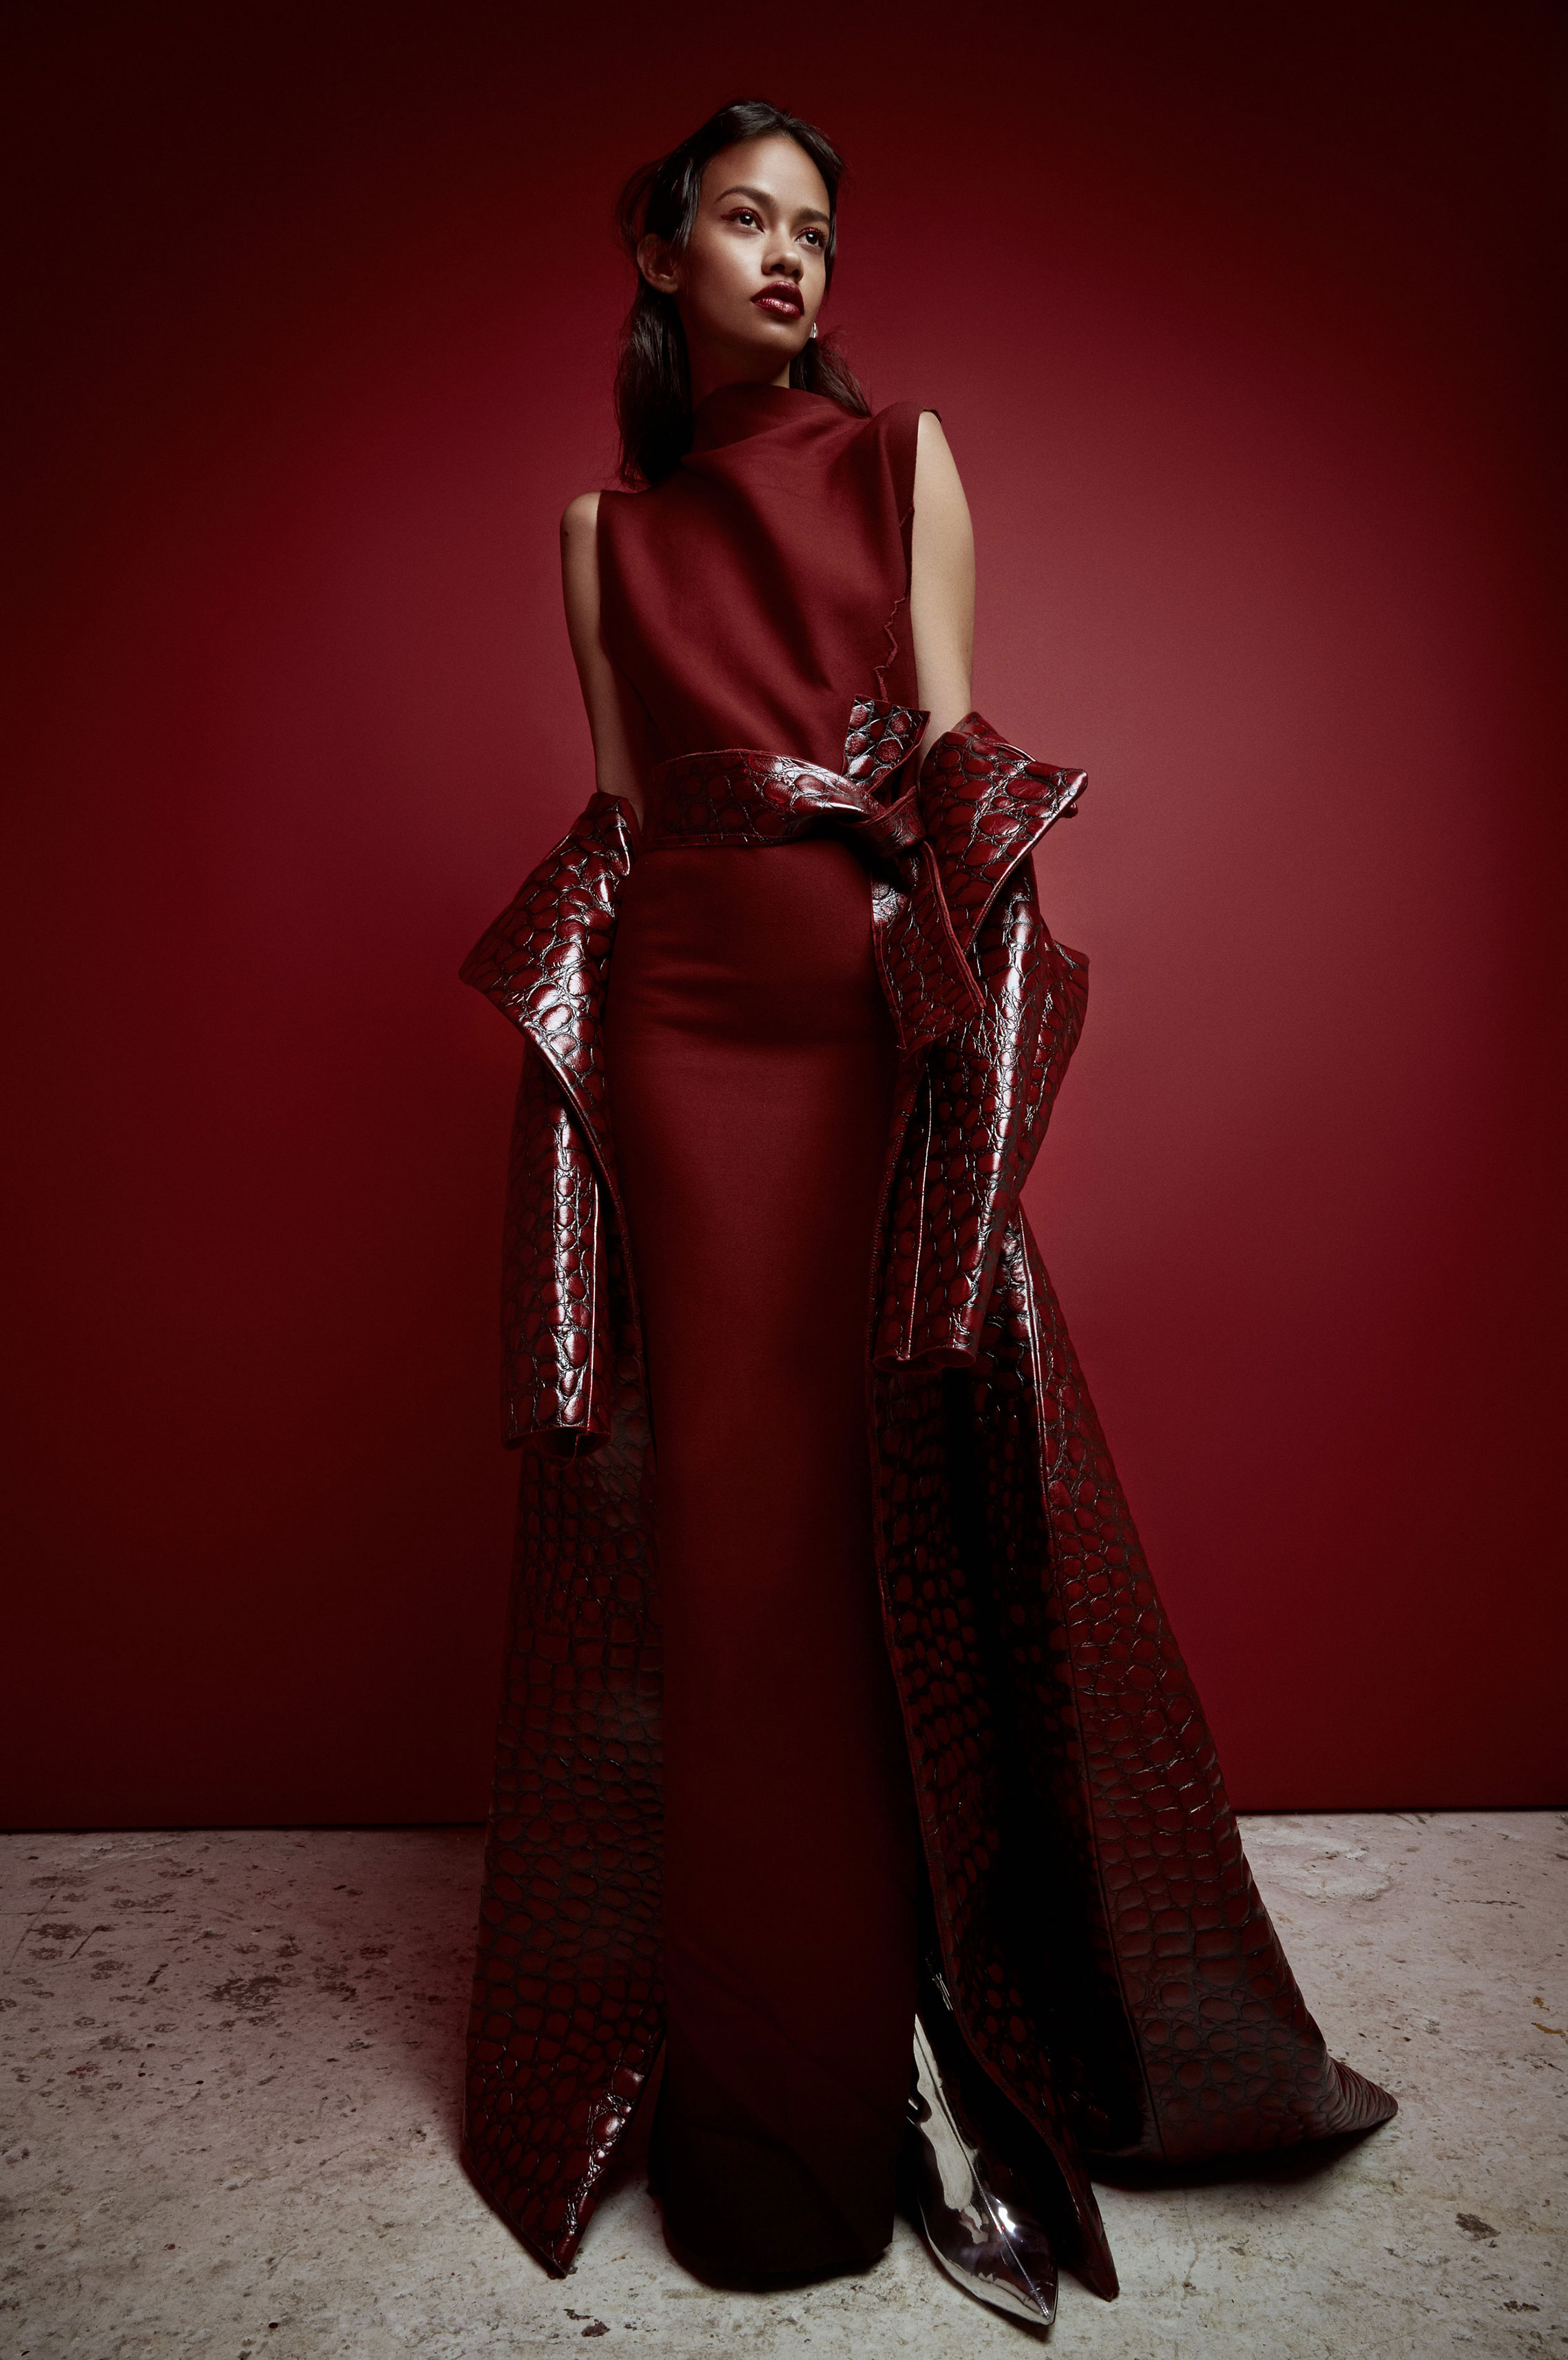 Таис Мартинс - женщина в красном / фото 10